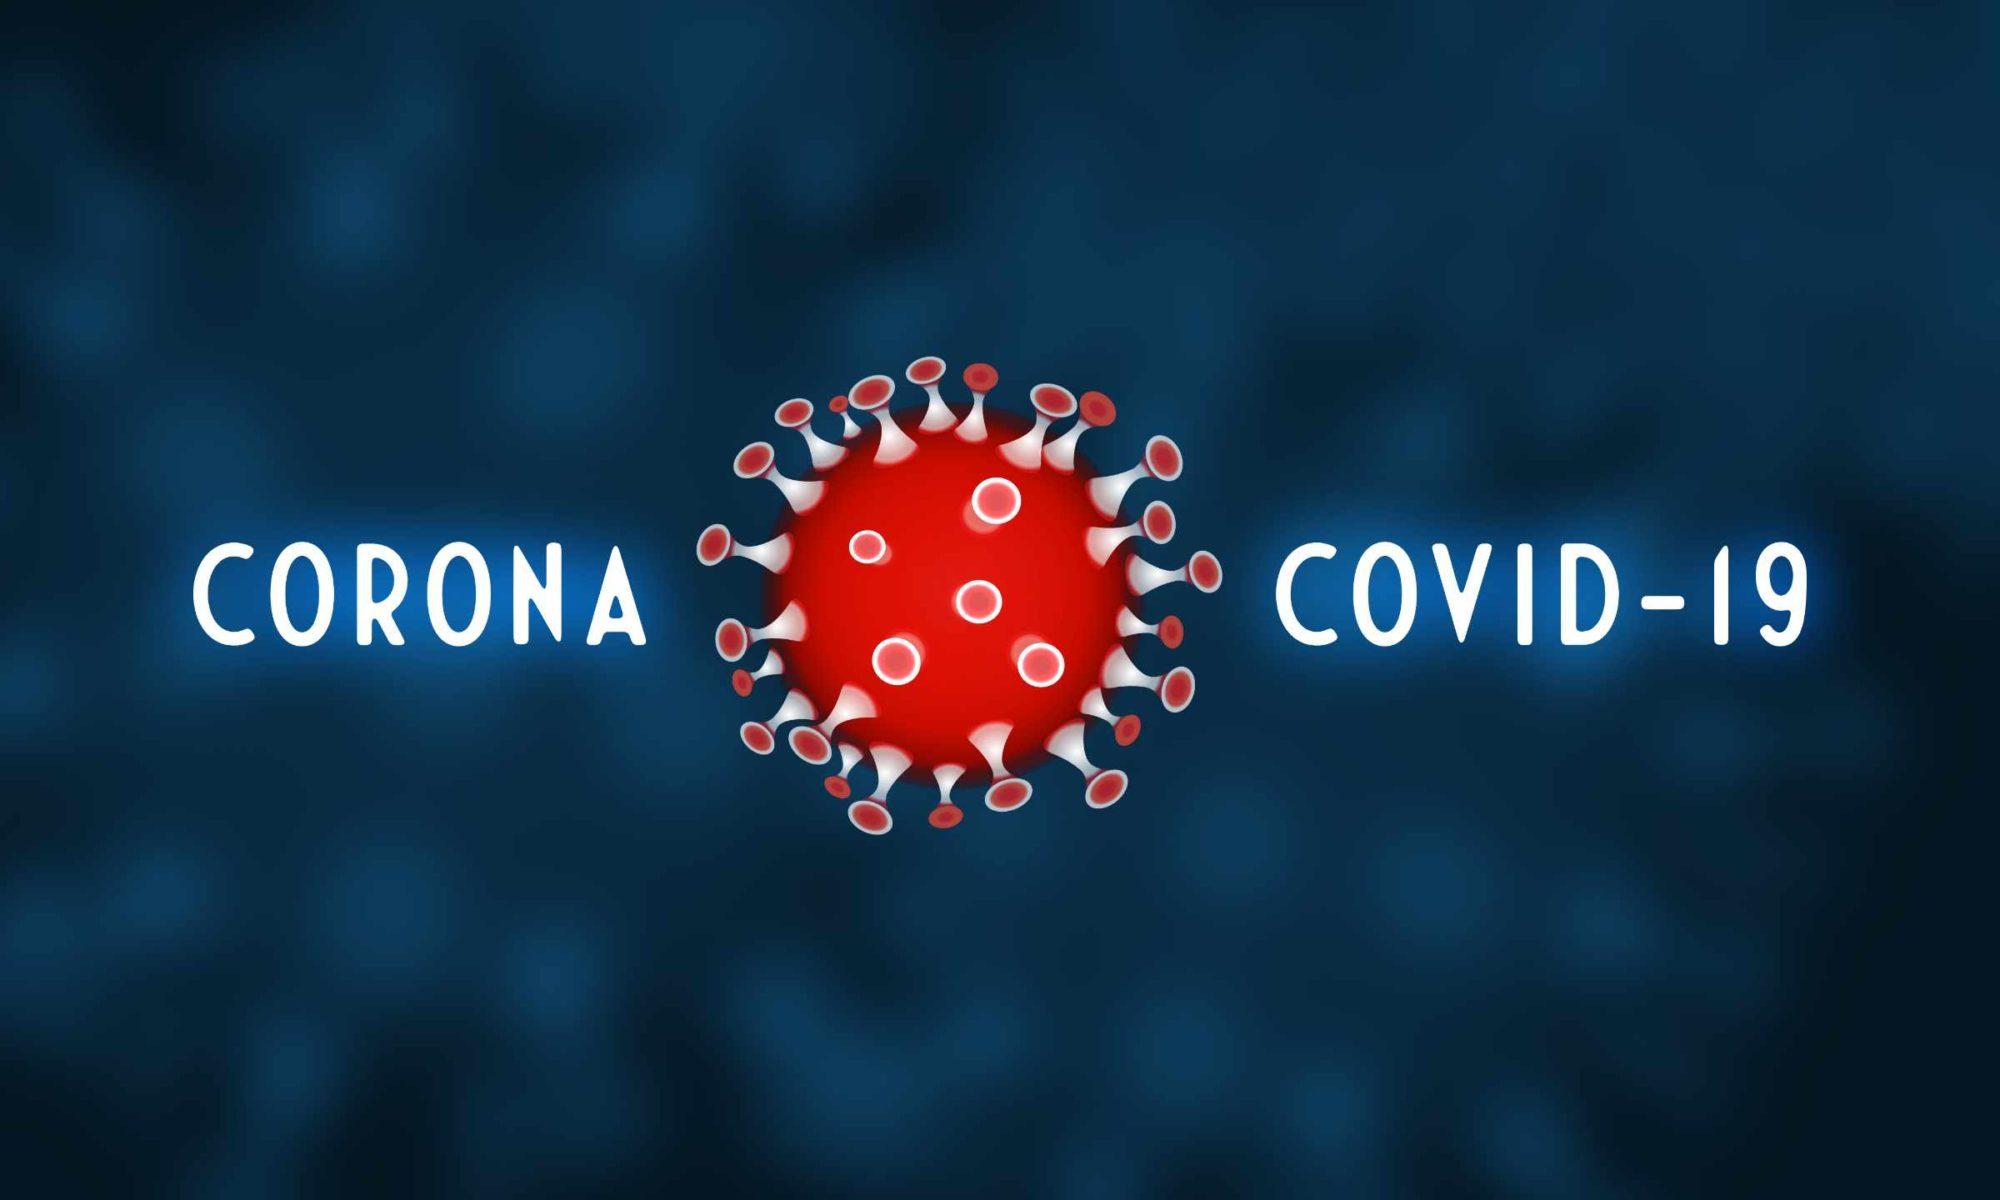 Forschung: Omega-3-Fettsäuren im Blut kann Sterberisiko bei Covid-19 beeinflussen. (Bild: iXimus/Pixabay)